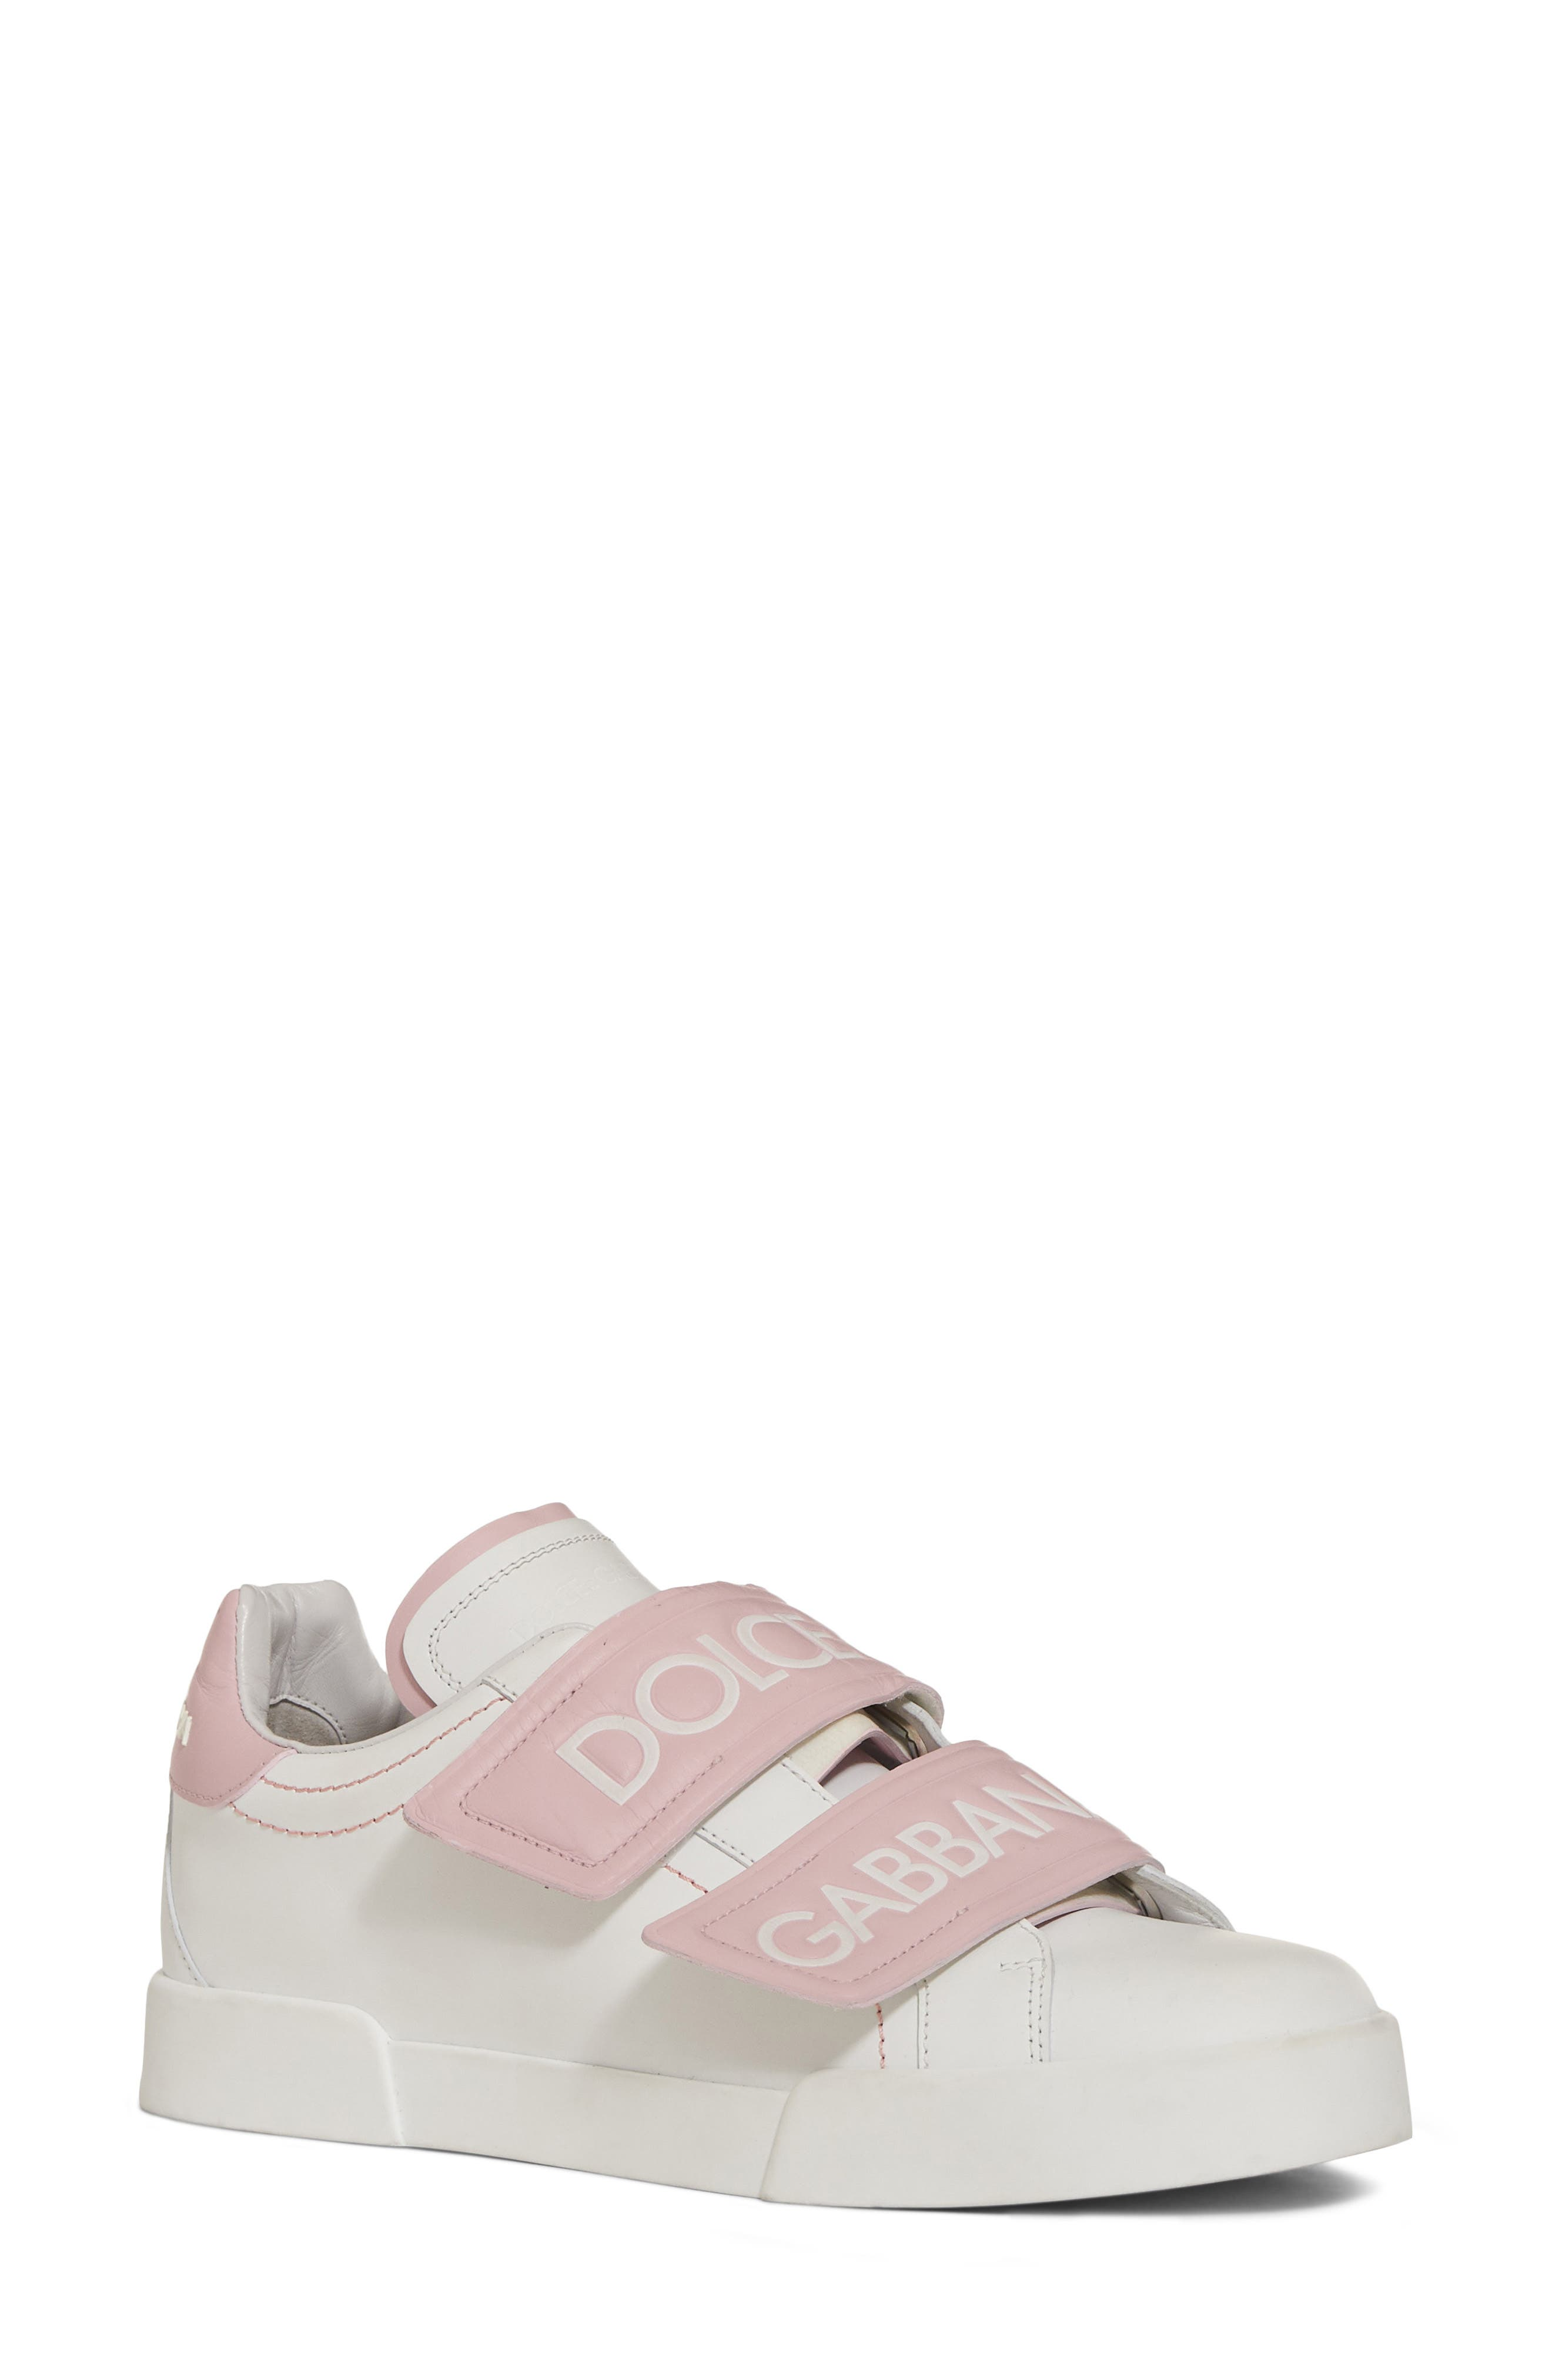 Main Image - Dolce&Gabbana Logo Strap Sneaker (Women)